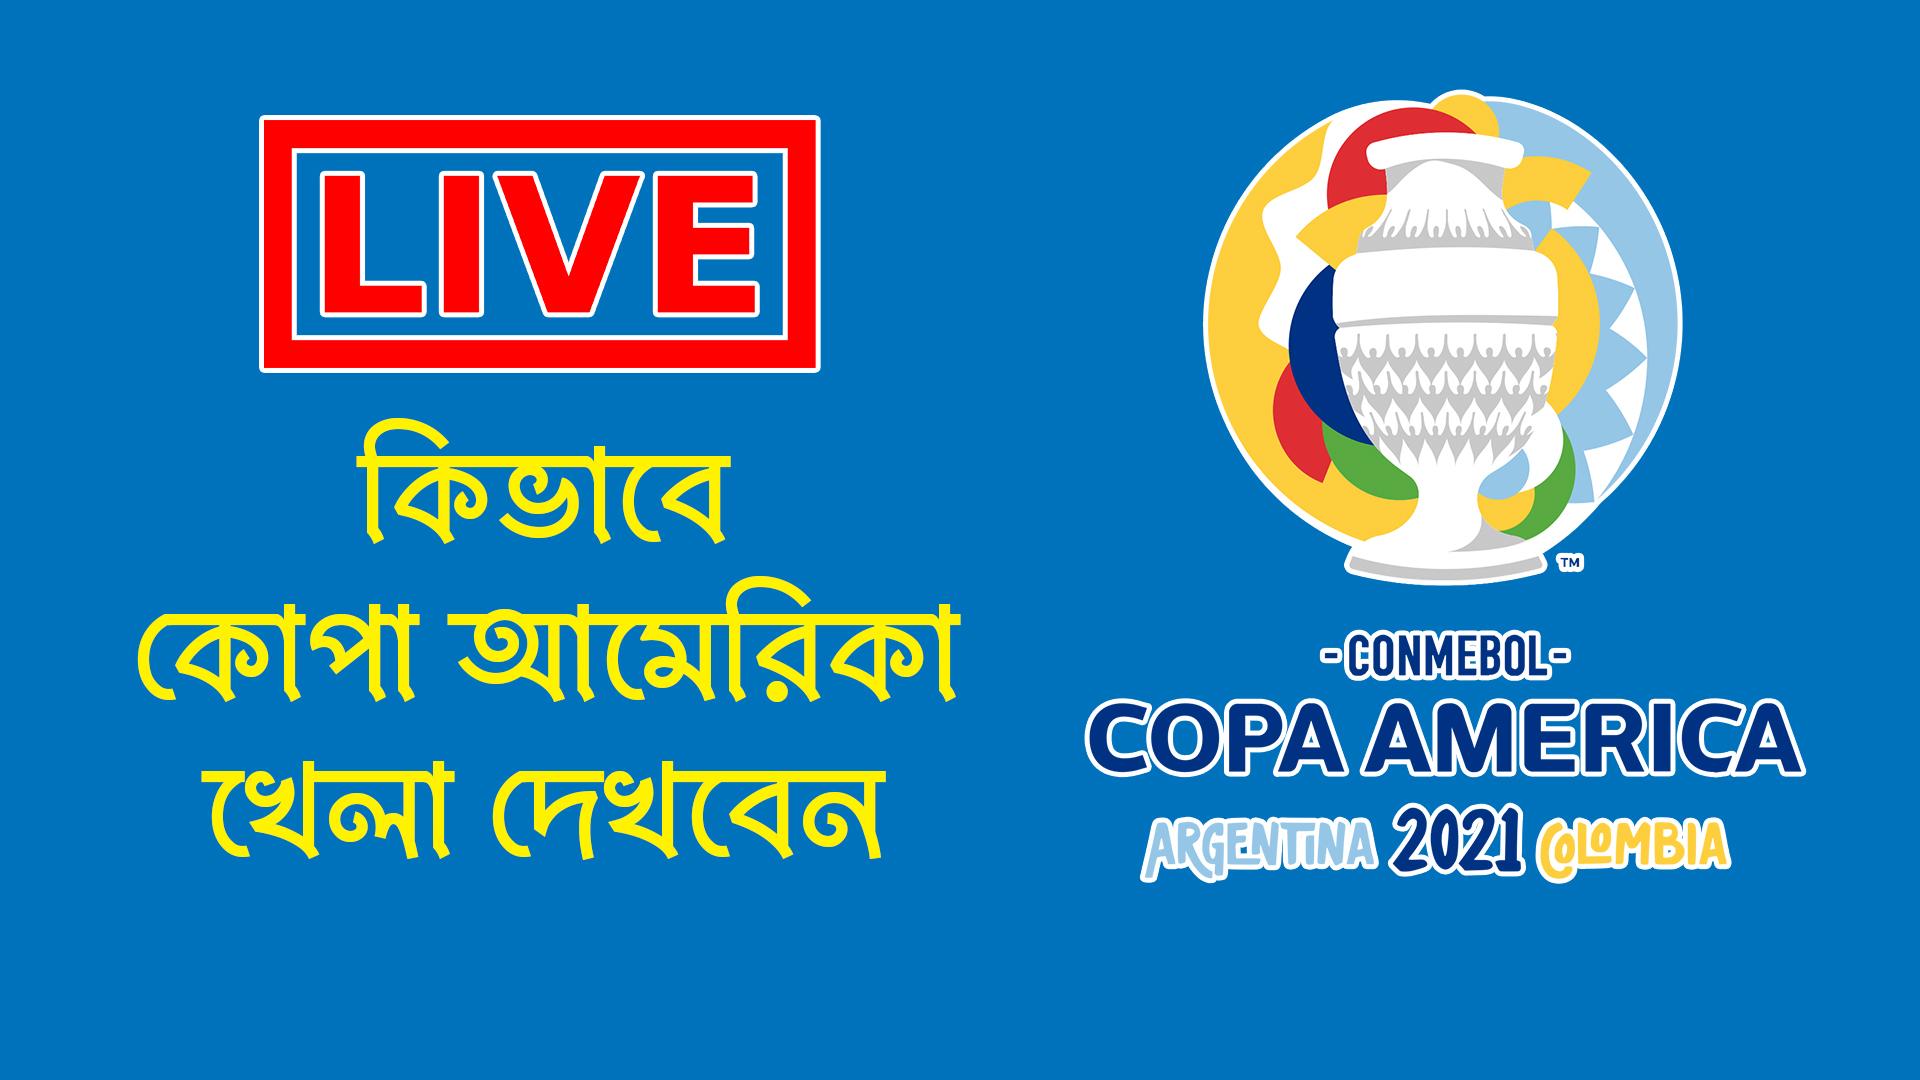 Copa America live stream 2021